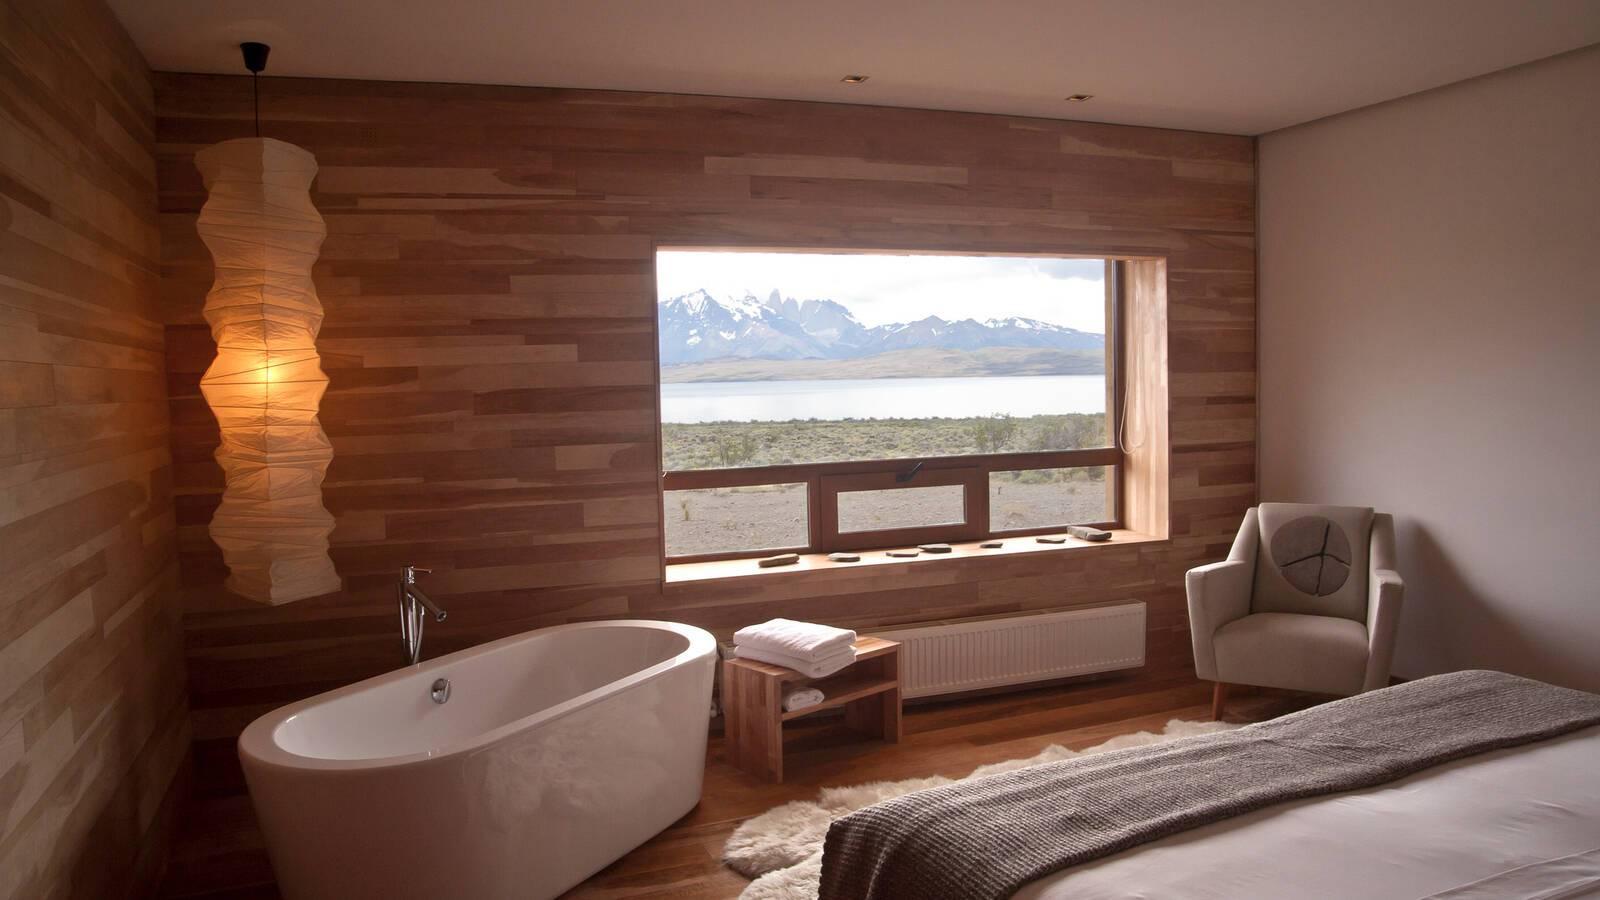 Tierra Patagonia Chili chambre standard